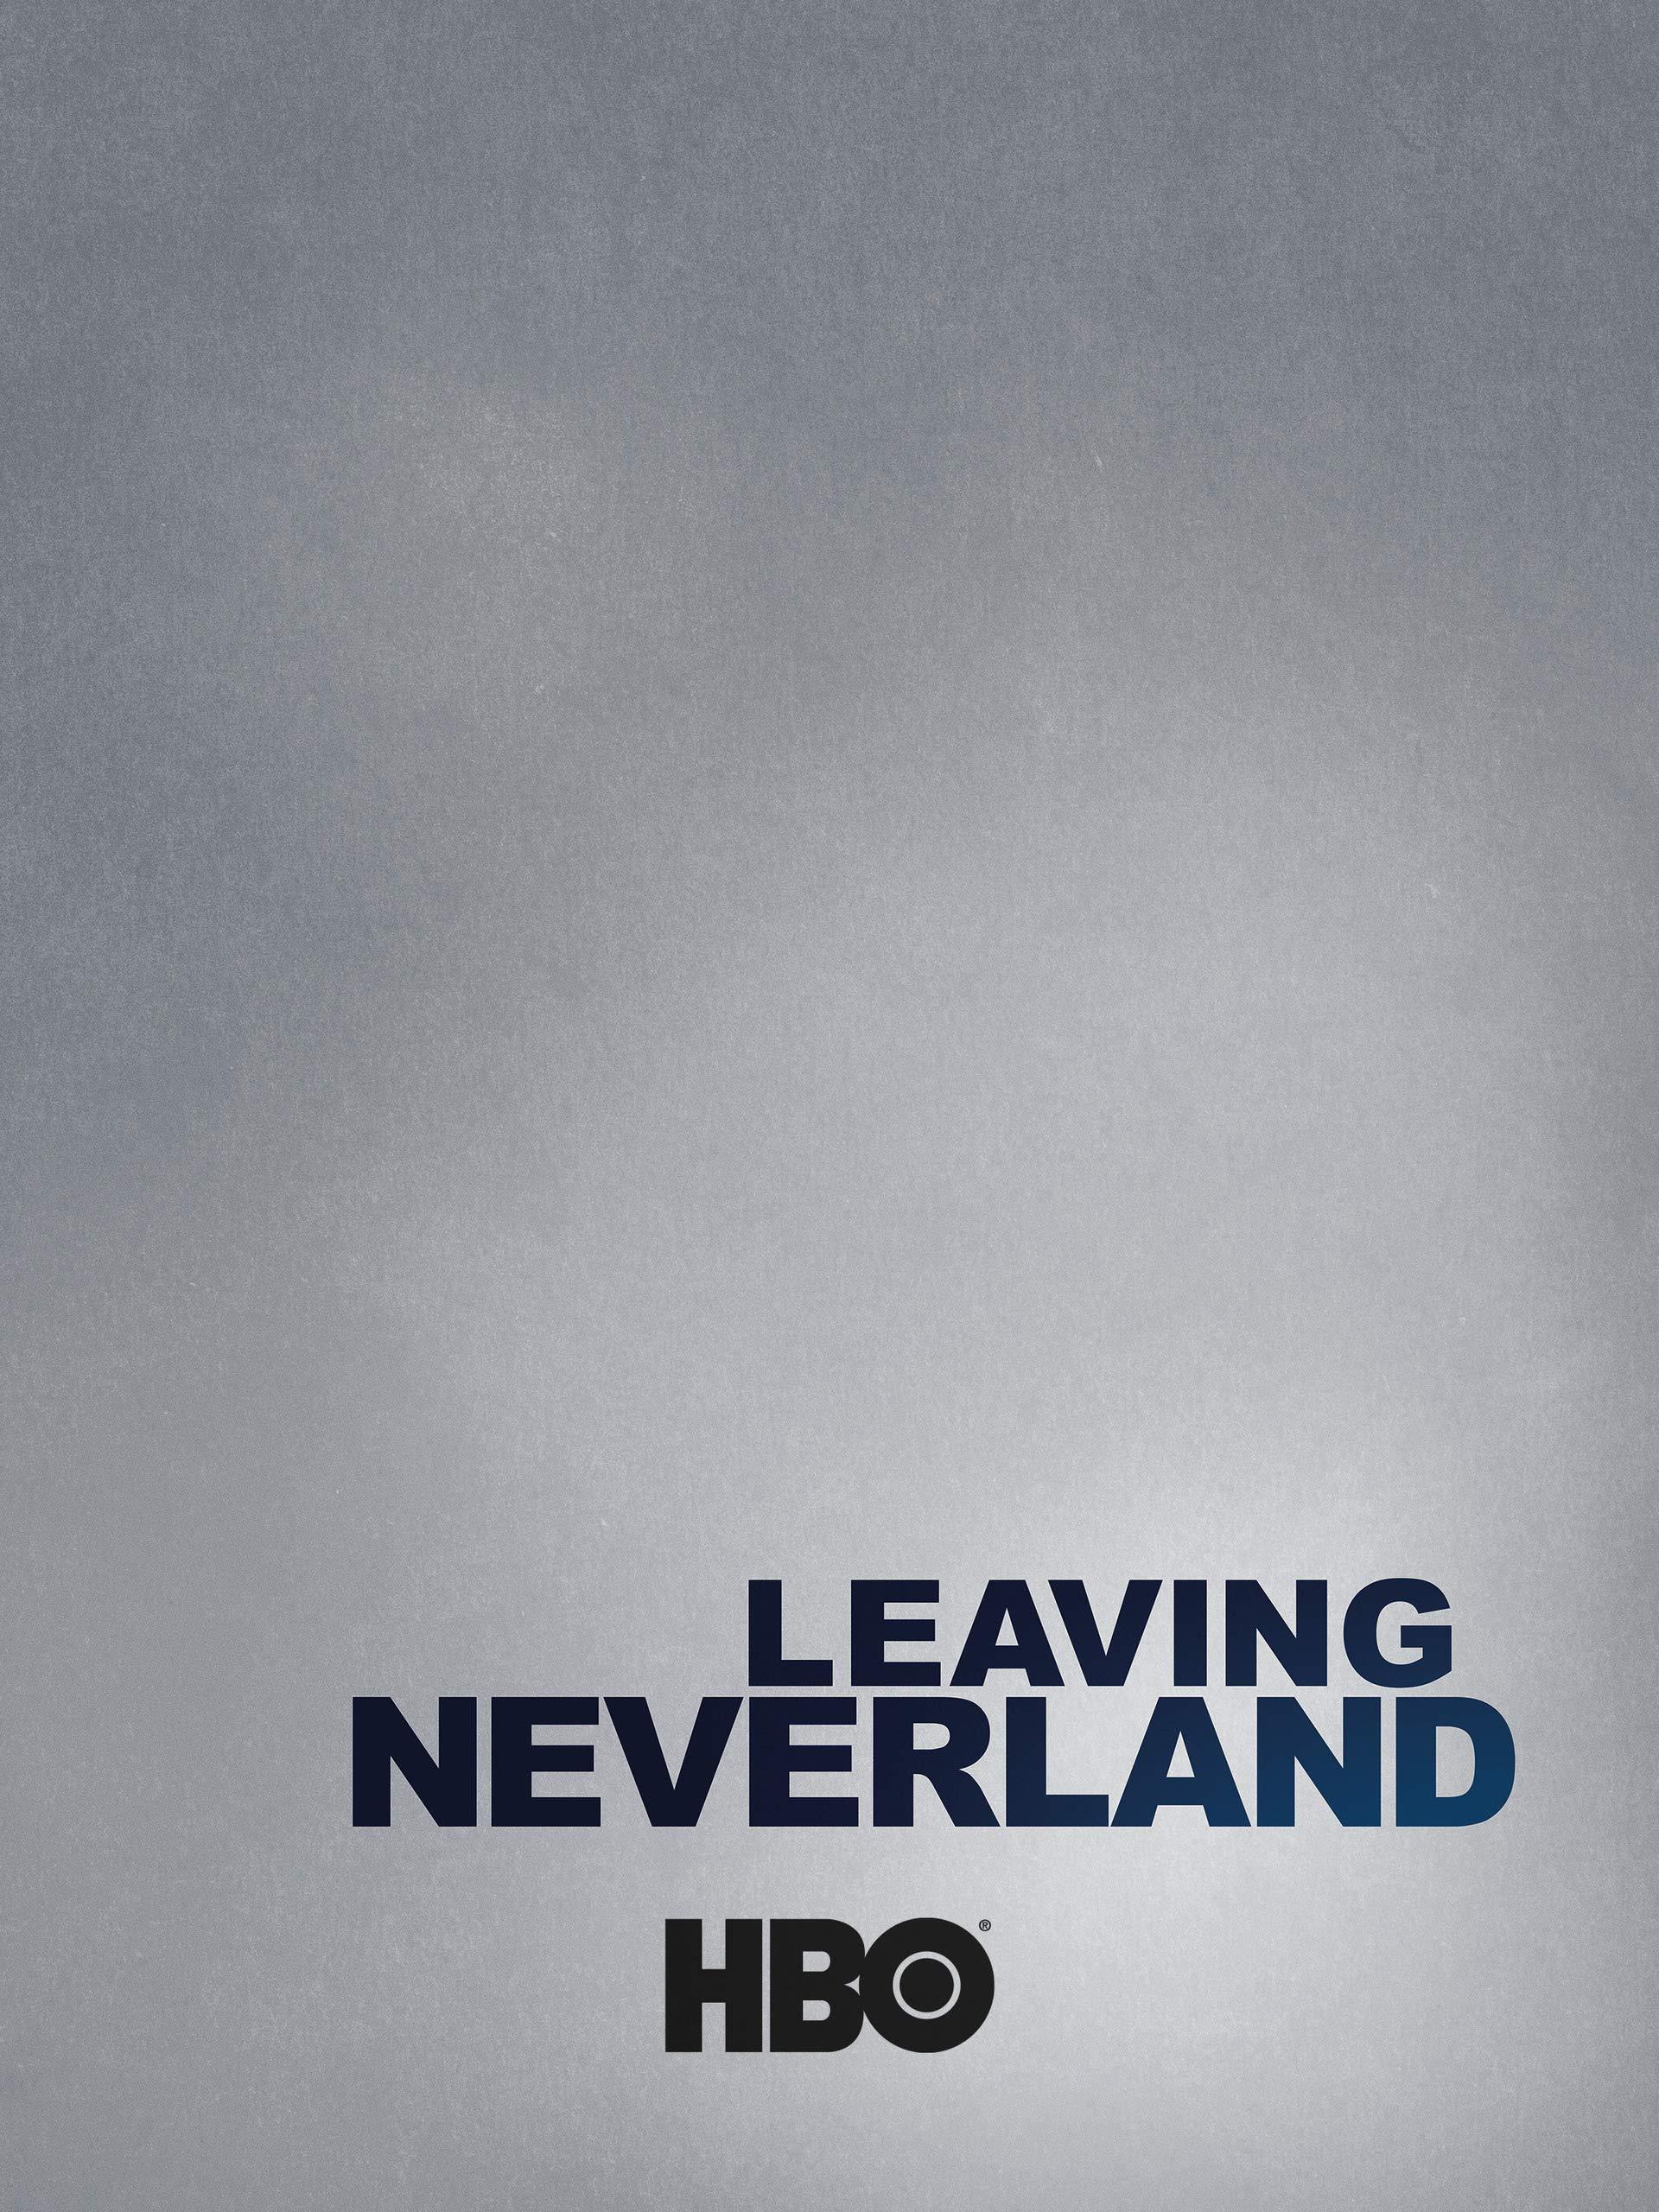 leaving neverland part 2 stream free